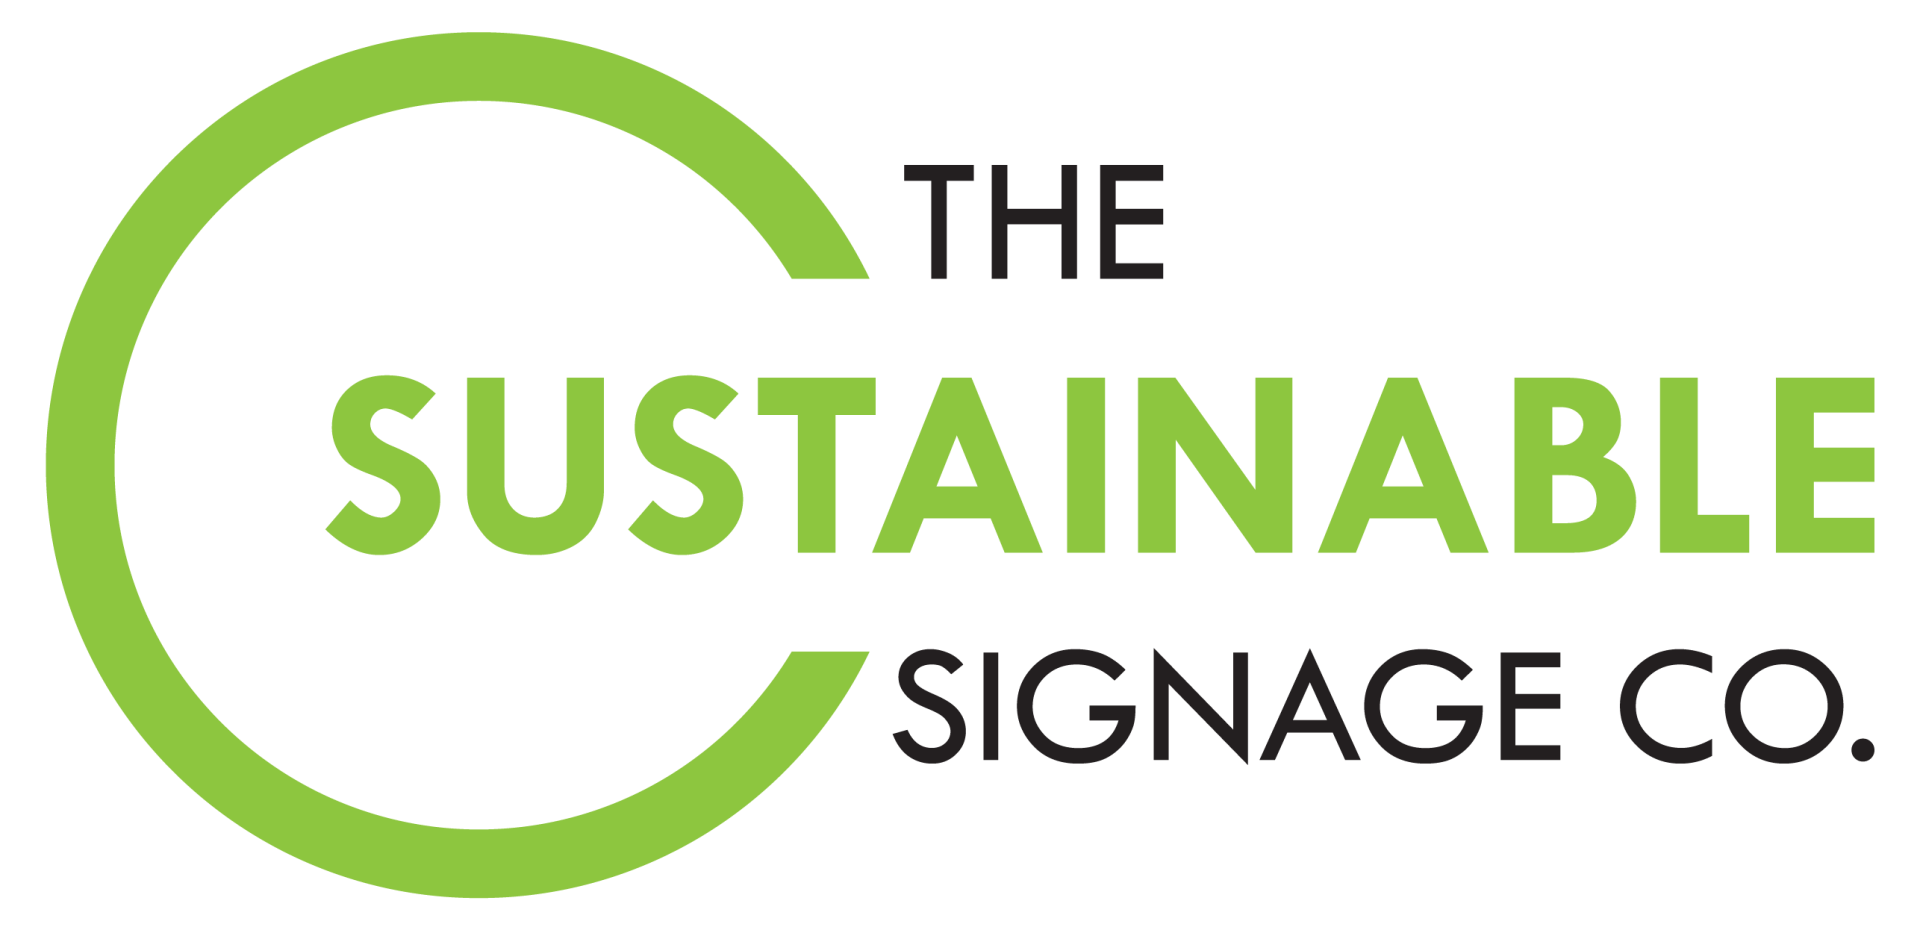 The Sustainable Signage Co